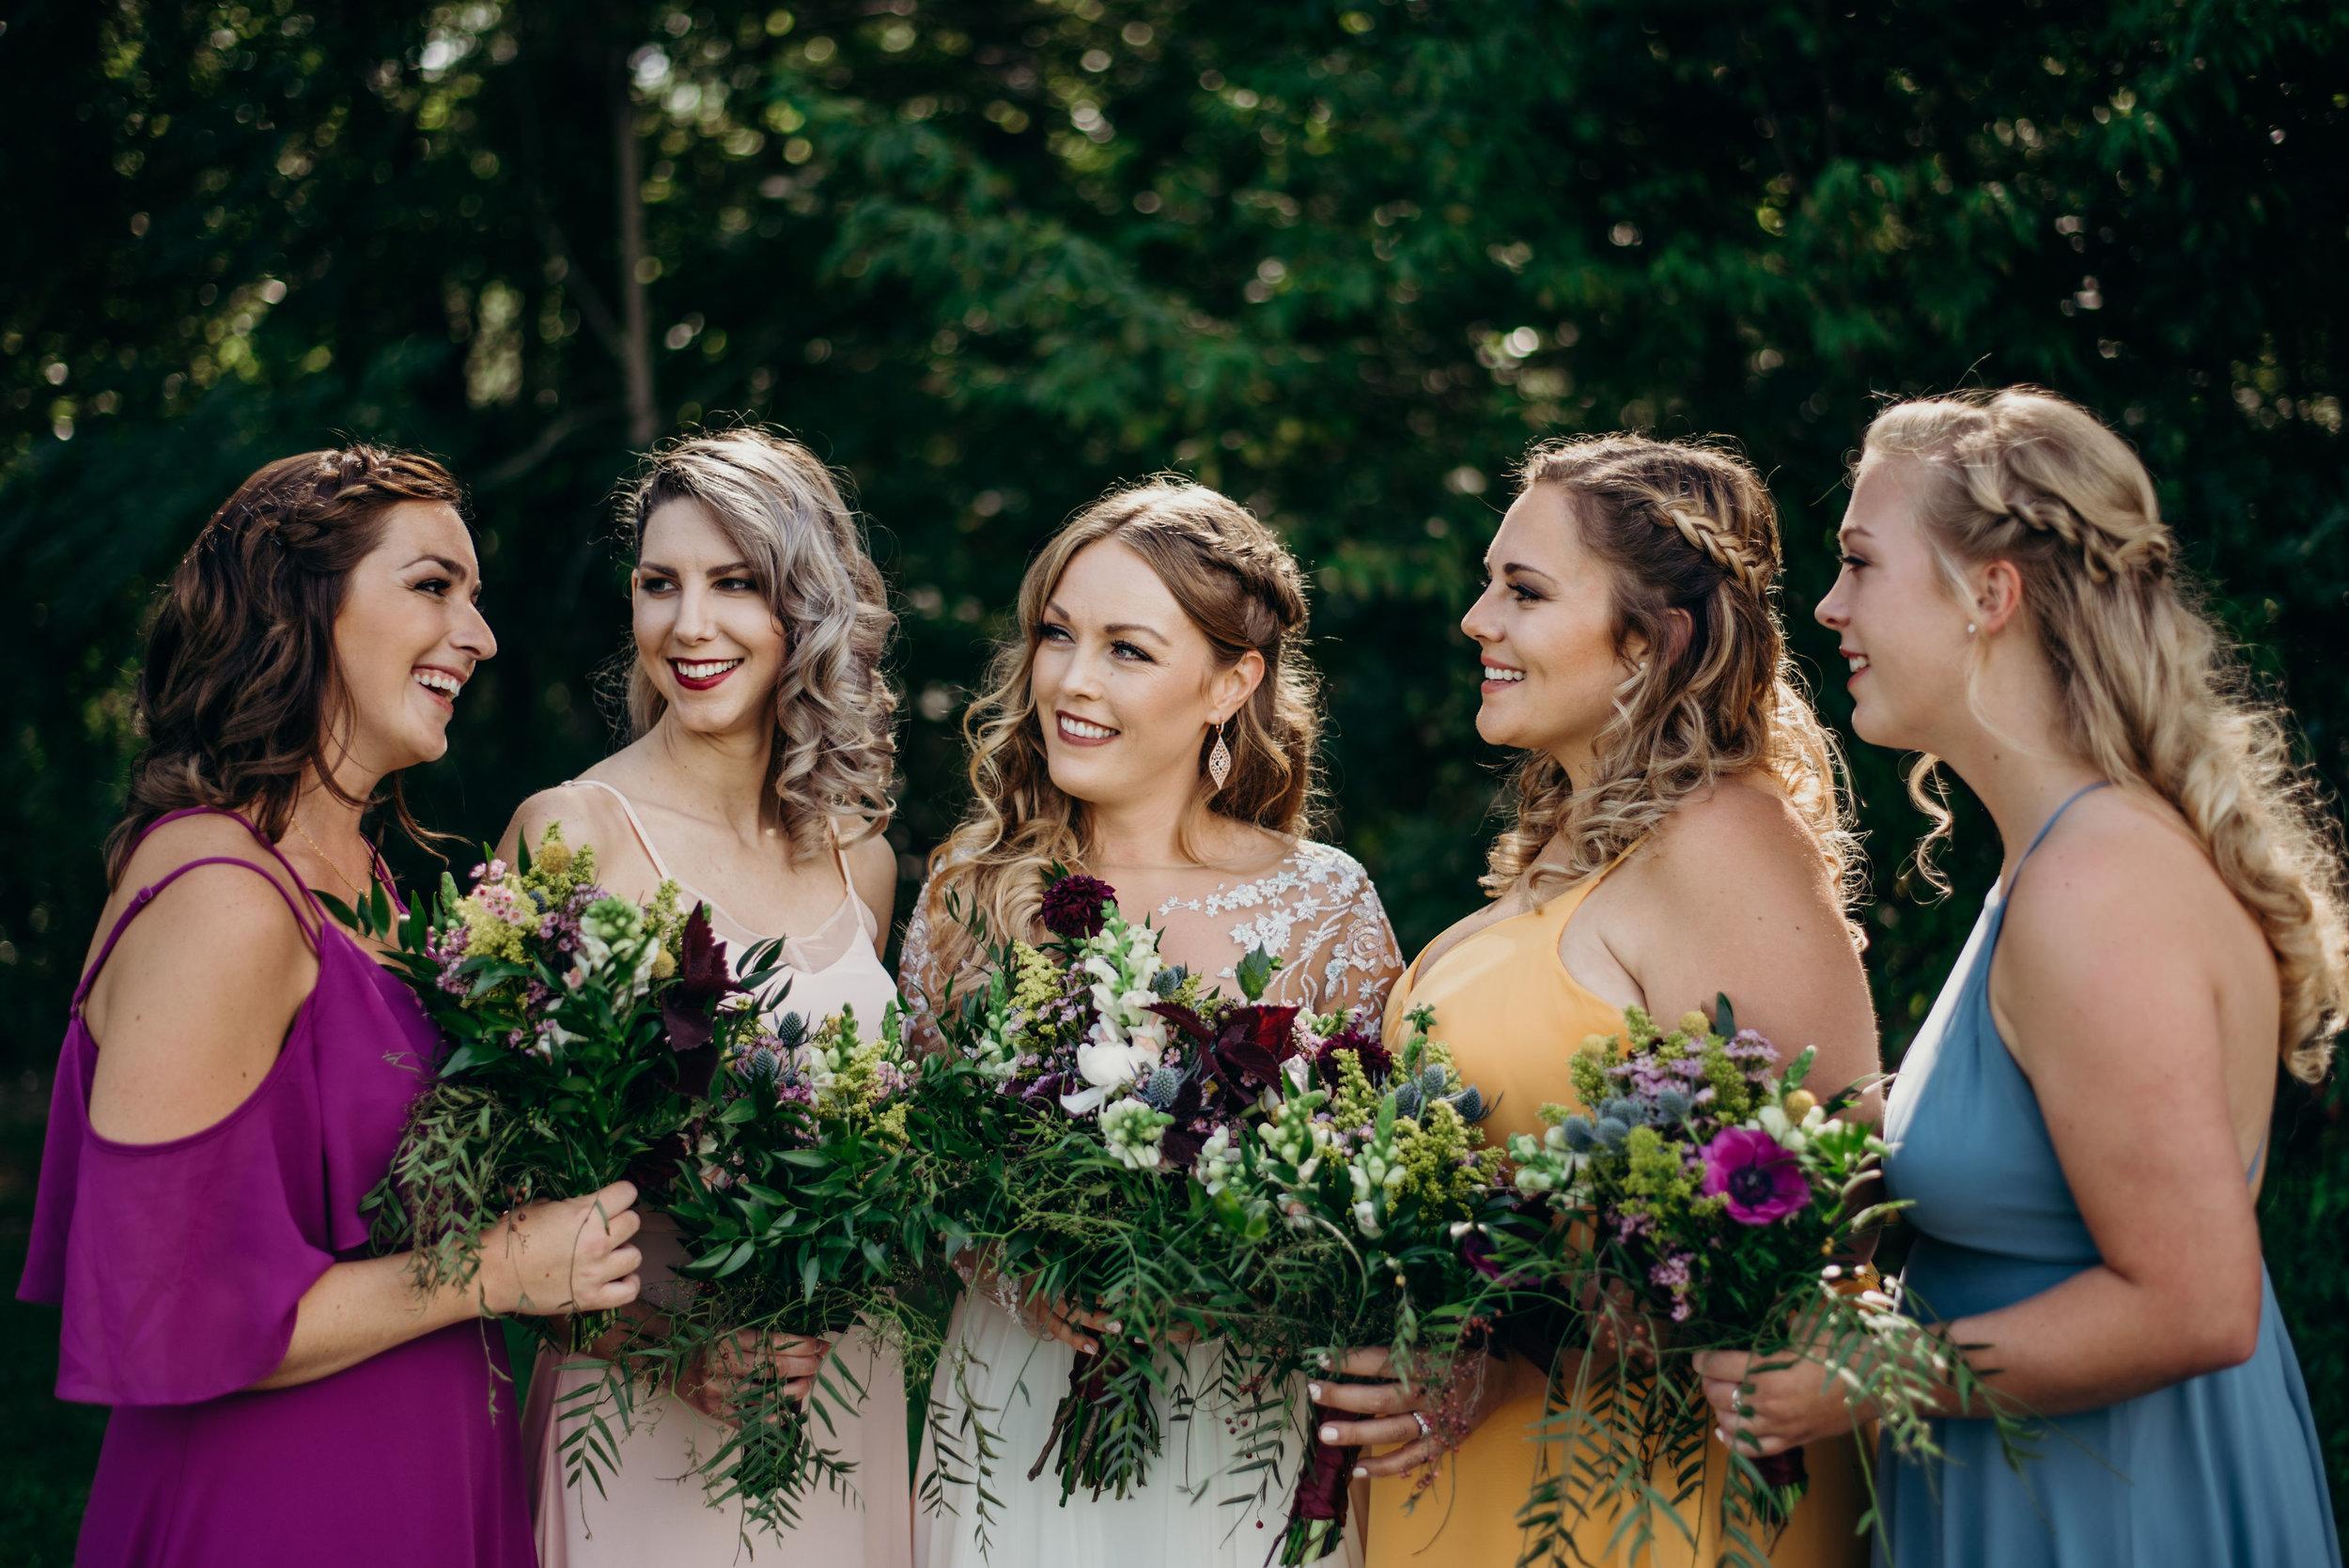 ryan-lauren-wedding-at-montfair-resort-farm-lindsey-paradiso-photography-1459.jpg